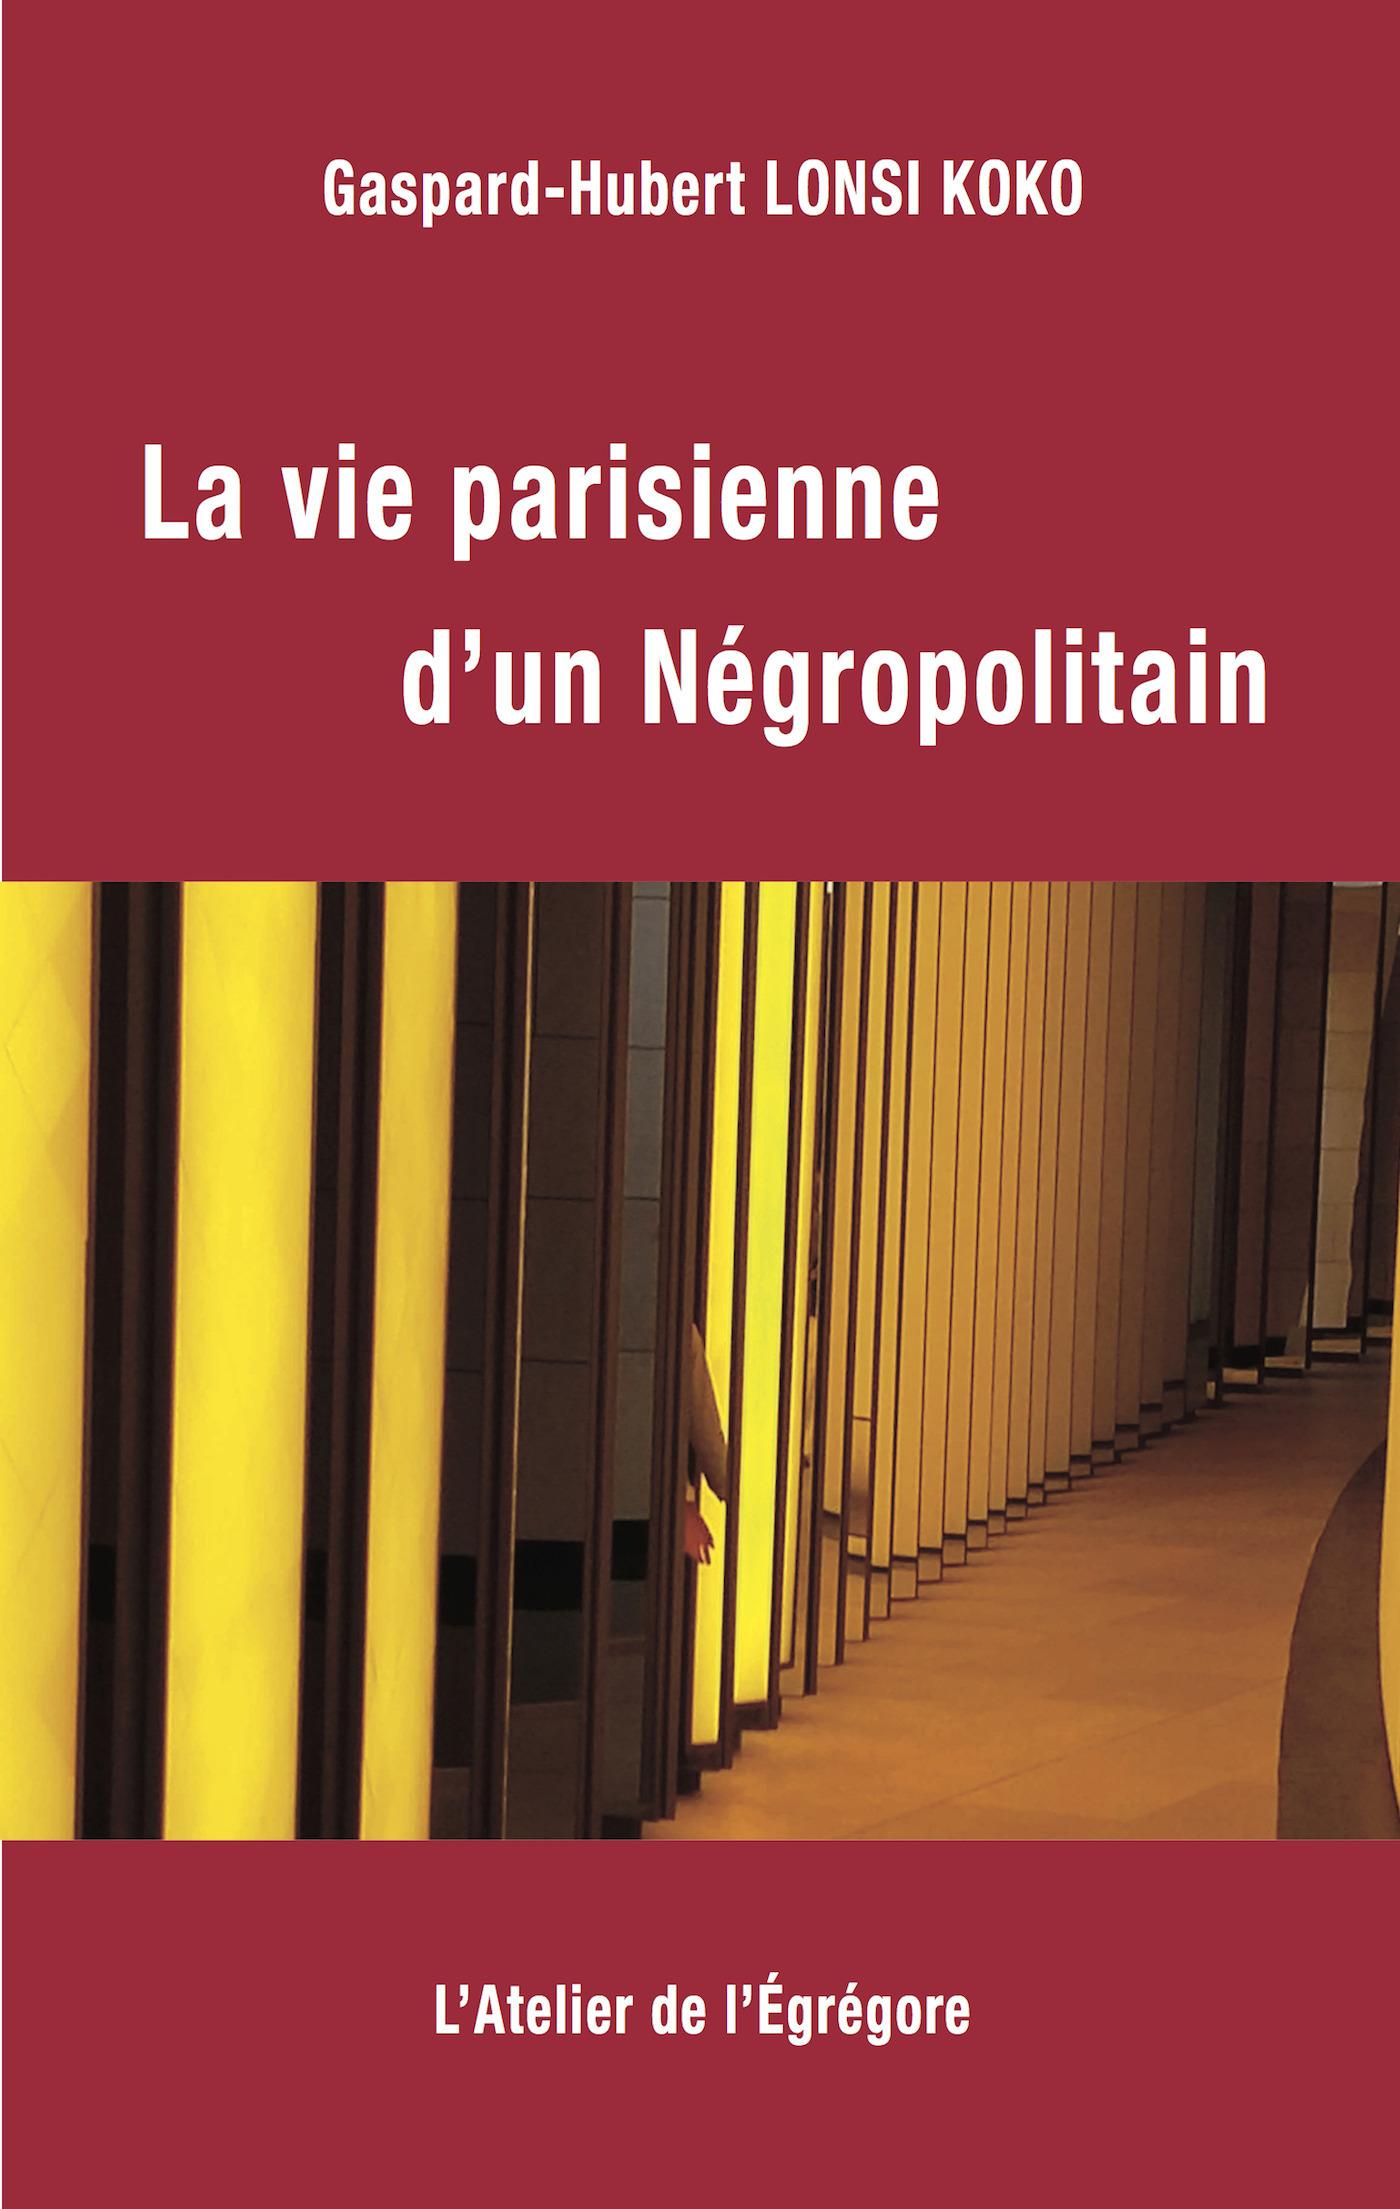 La vie parisienne d'un Négropolitain  - Gaspard-Hubert Lonsi Koko